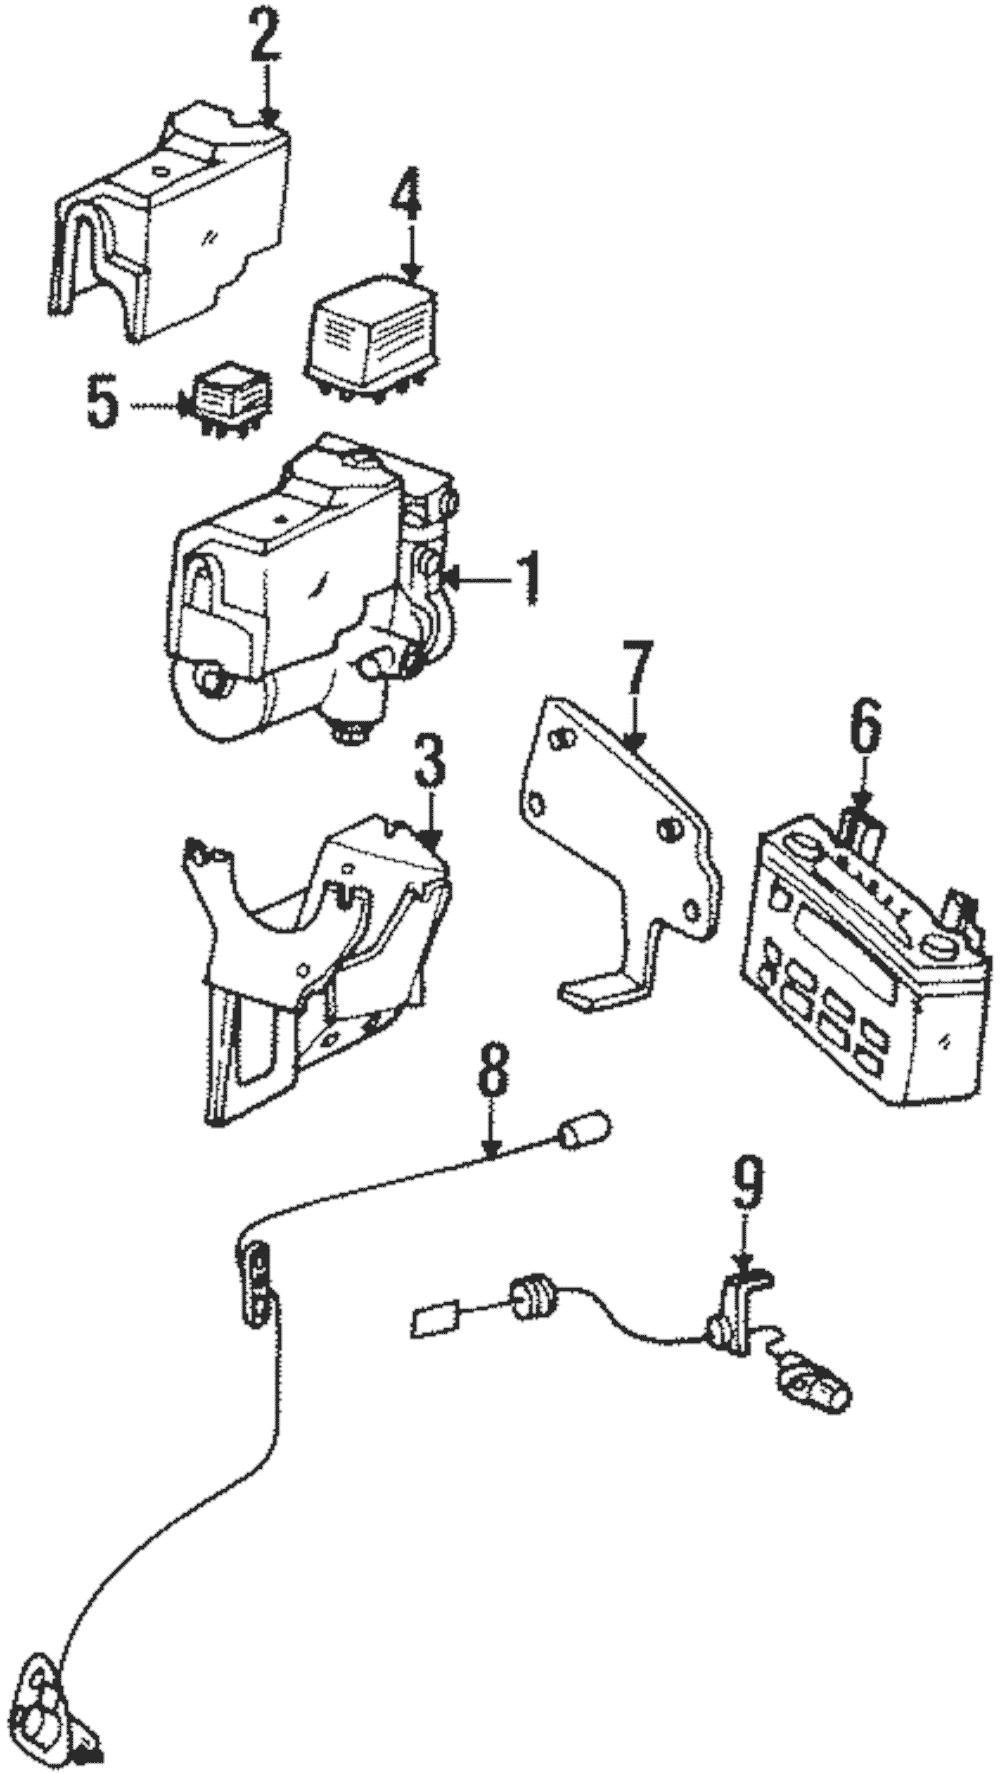 1994 mercedes e320 fuse box diagram